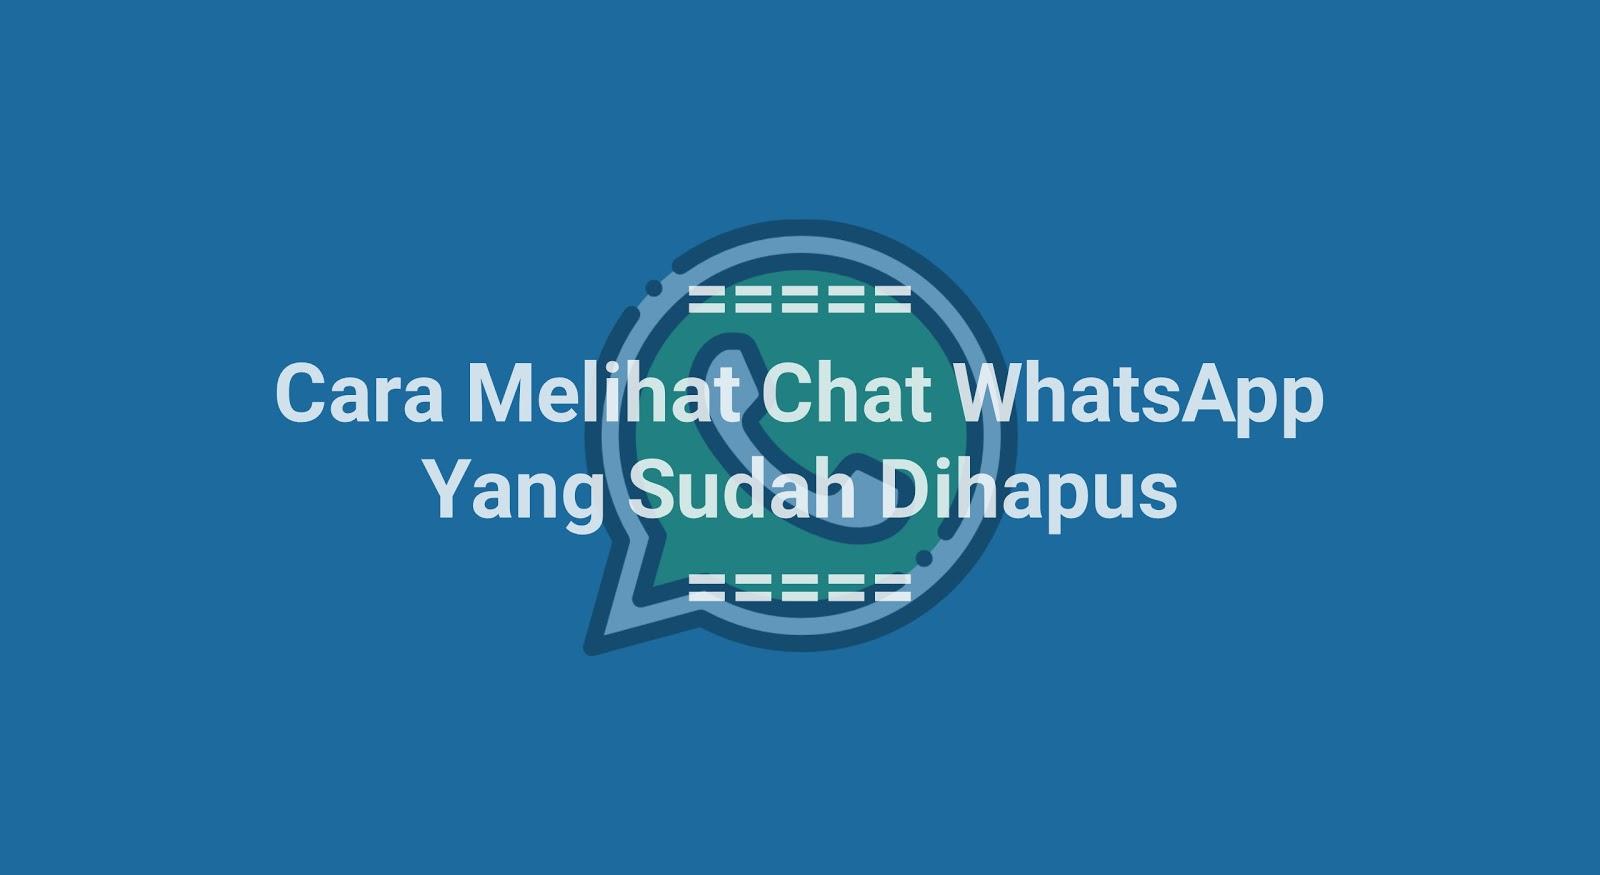 Cara Melihat Chat WhatsApp yang Sudah Dihapus